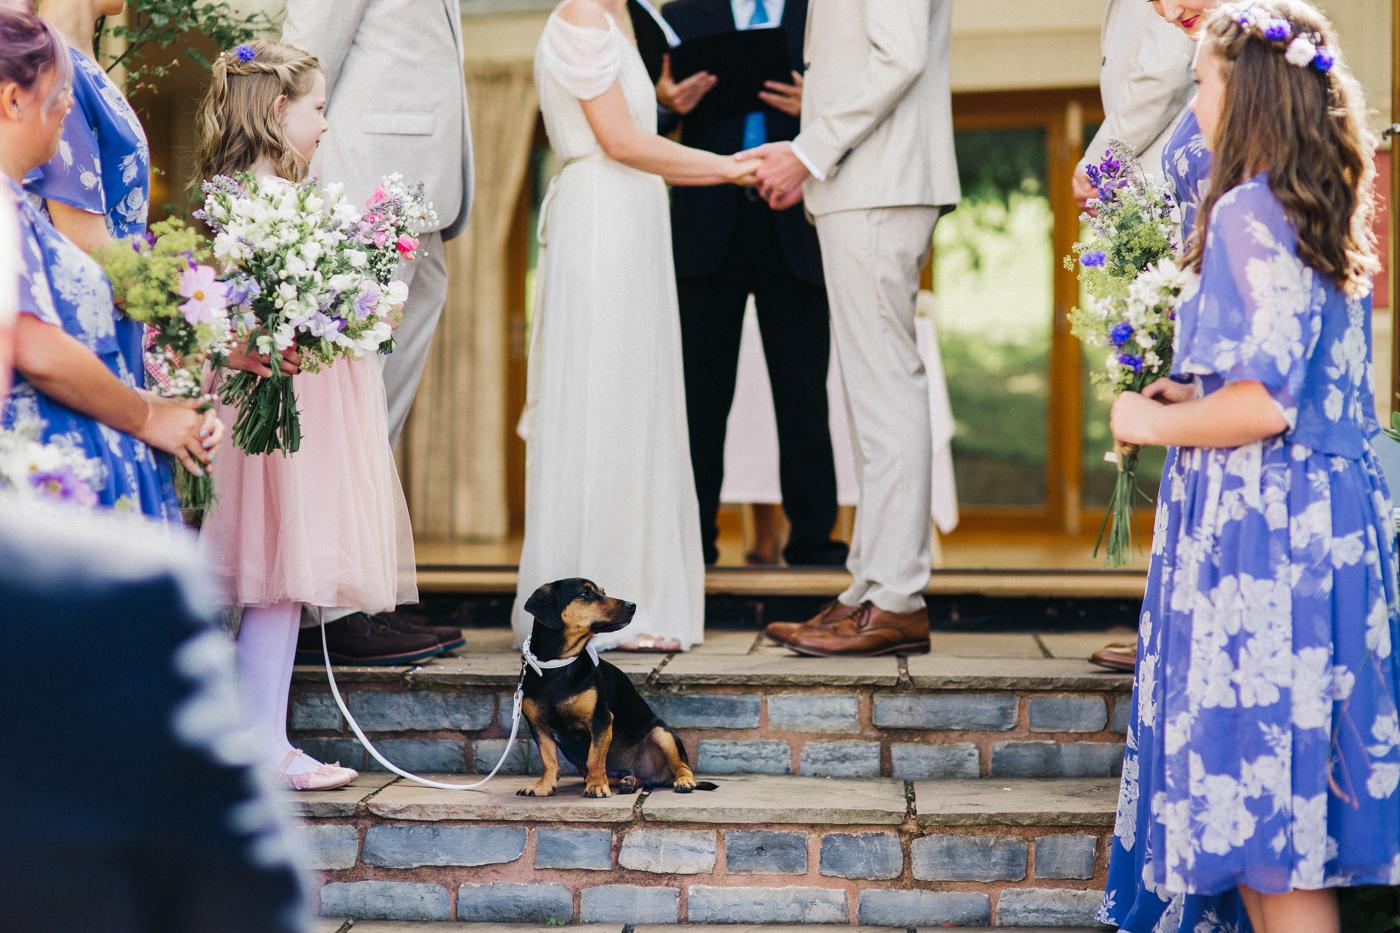 teesside-wedding-photographer-creative-marquee-outdoor-wedding-0001.jpg